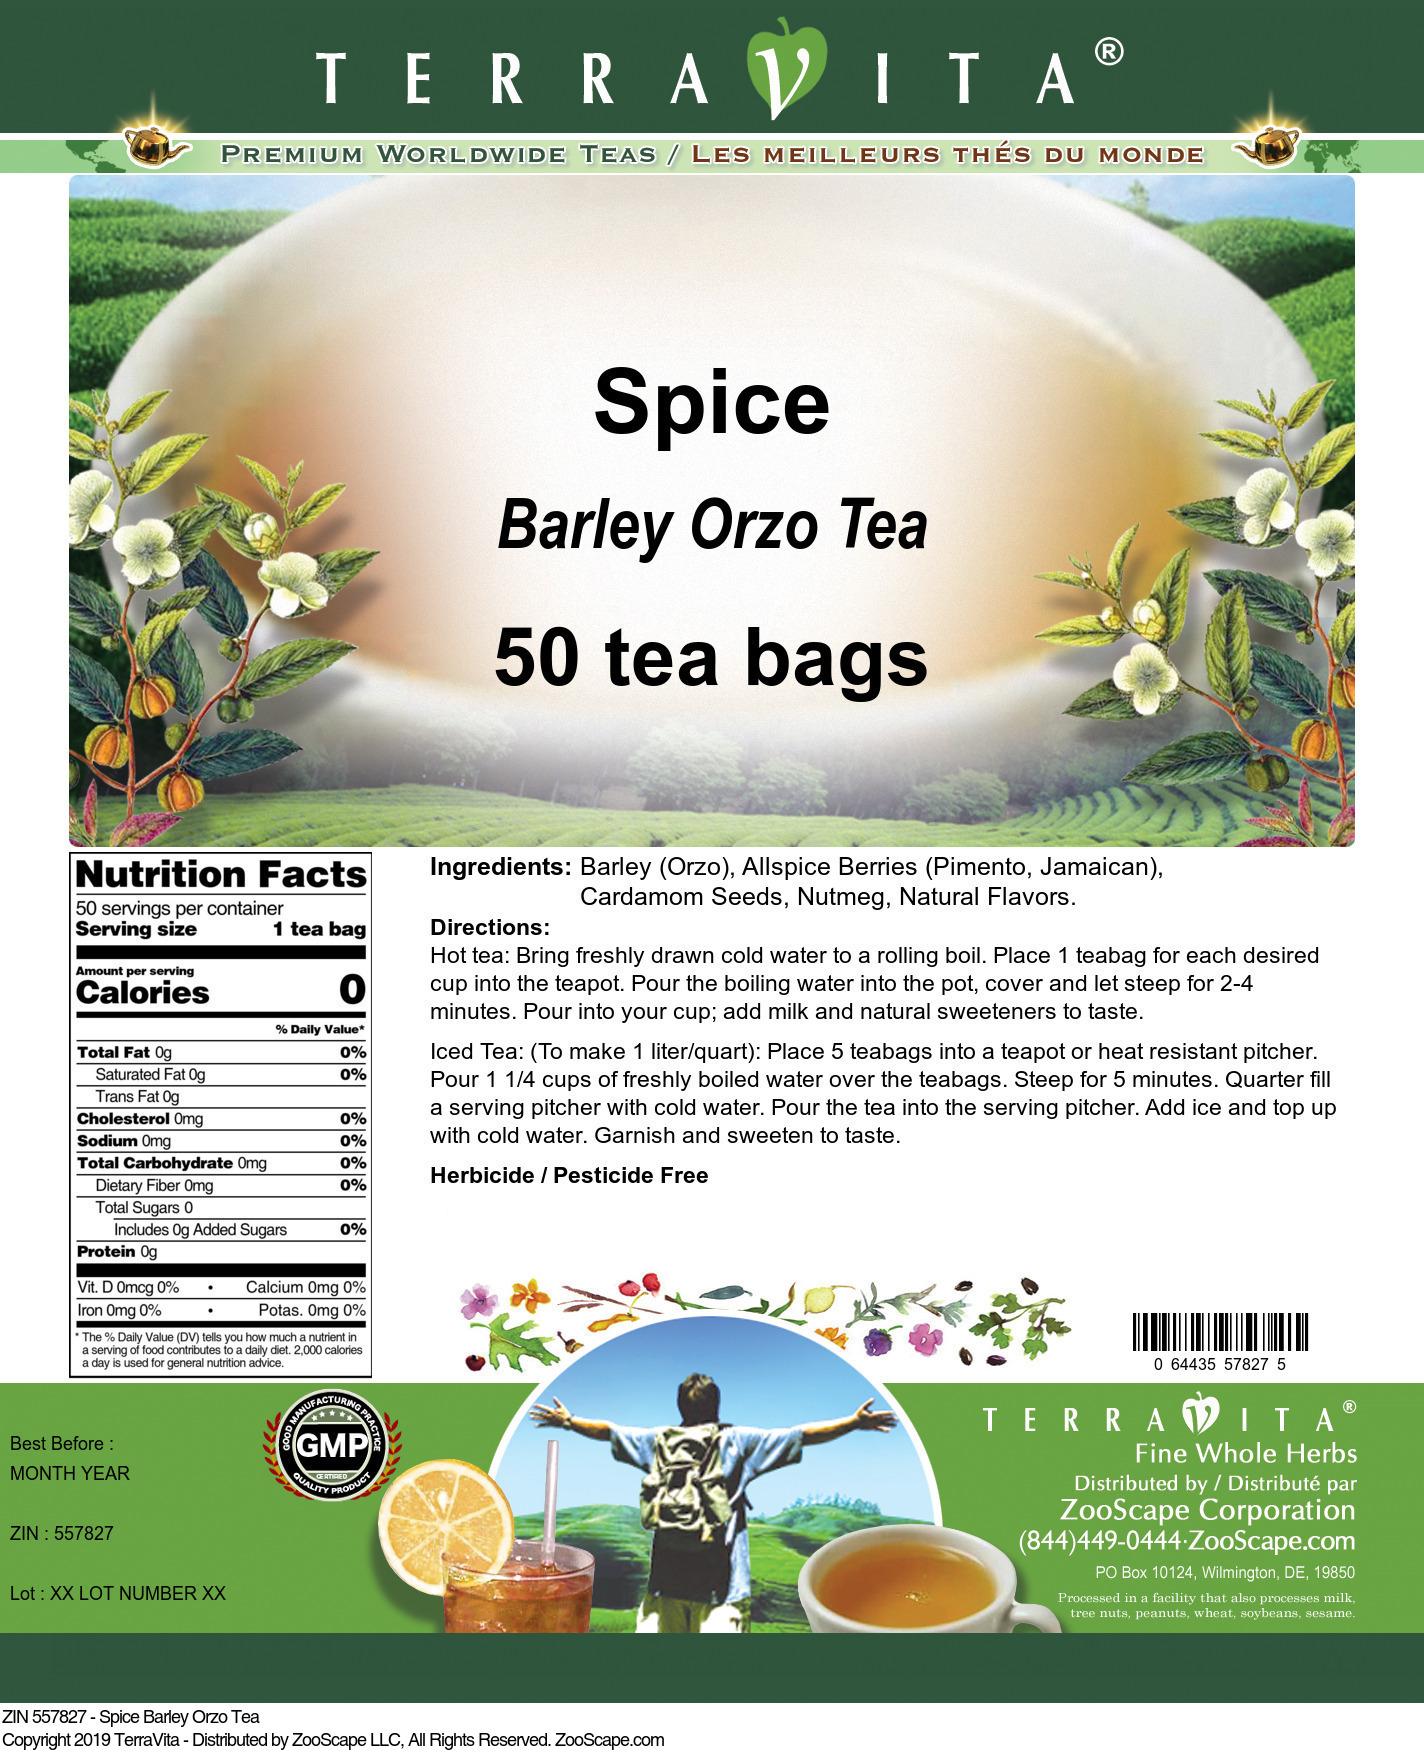 Spice Barley Orzo